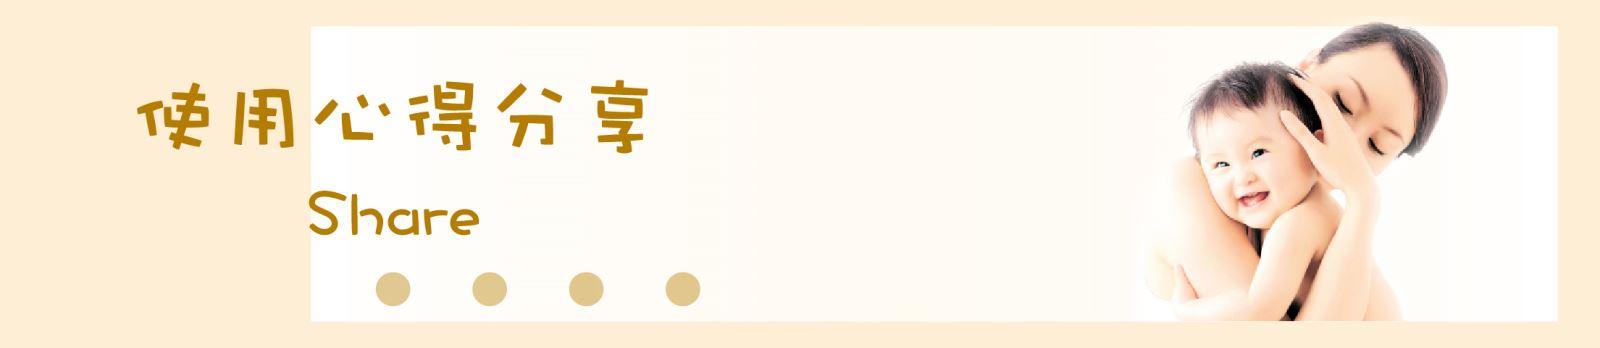 使用心得分享Banner.jpg